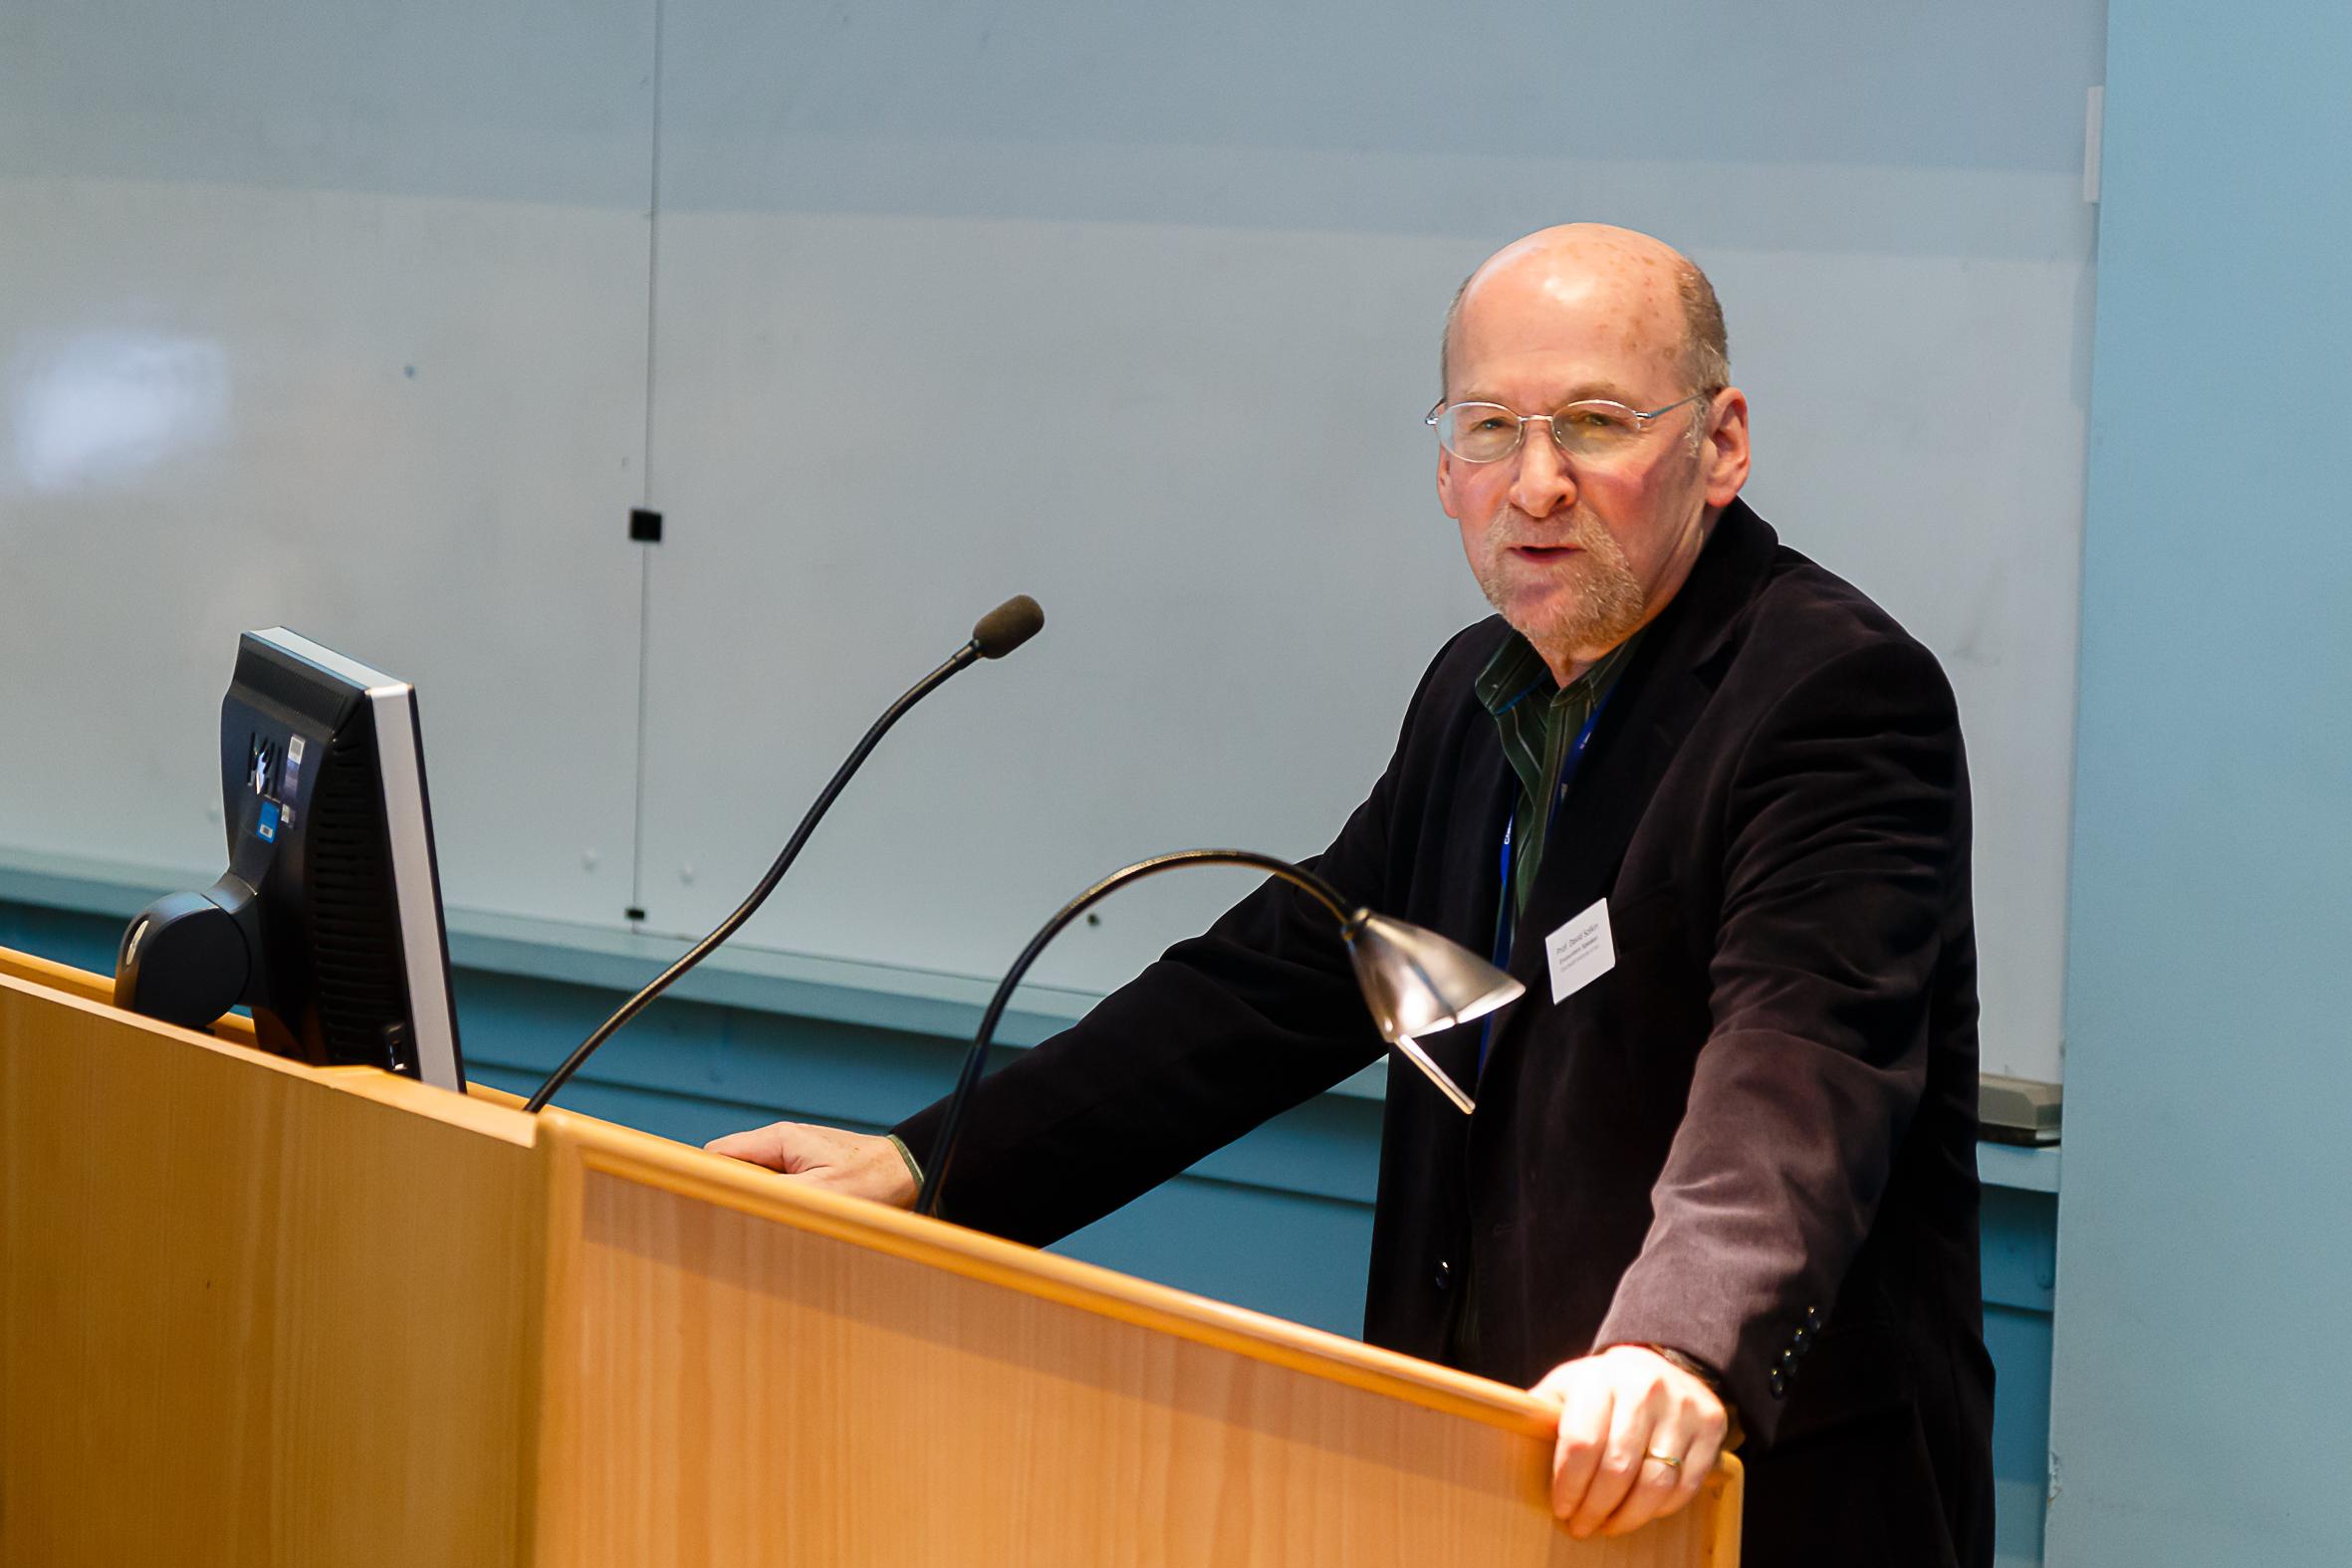 Professor David Solkin - Courtauld Institute of Art